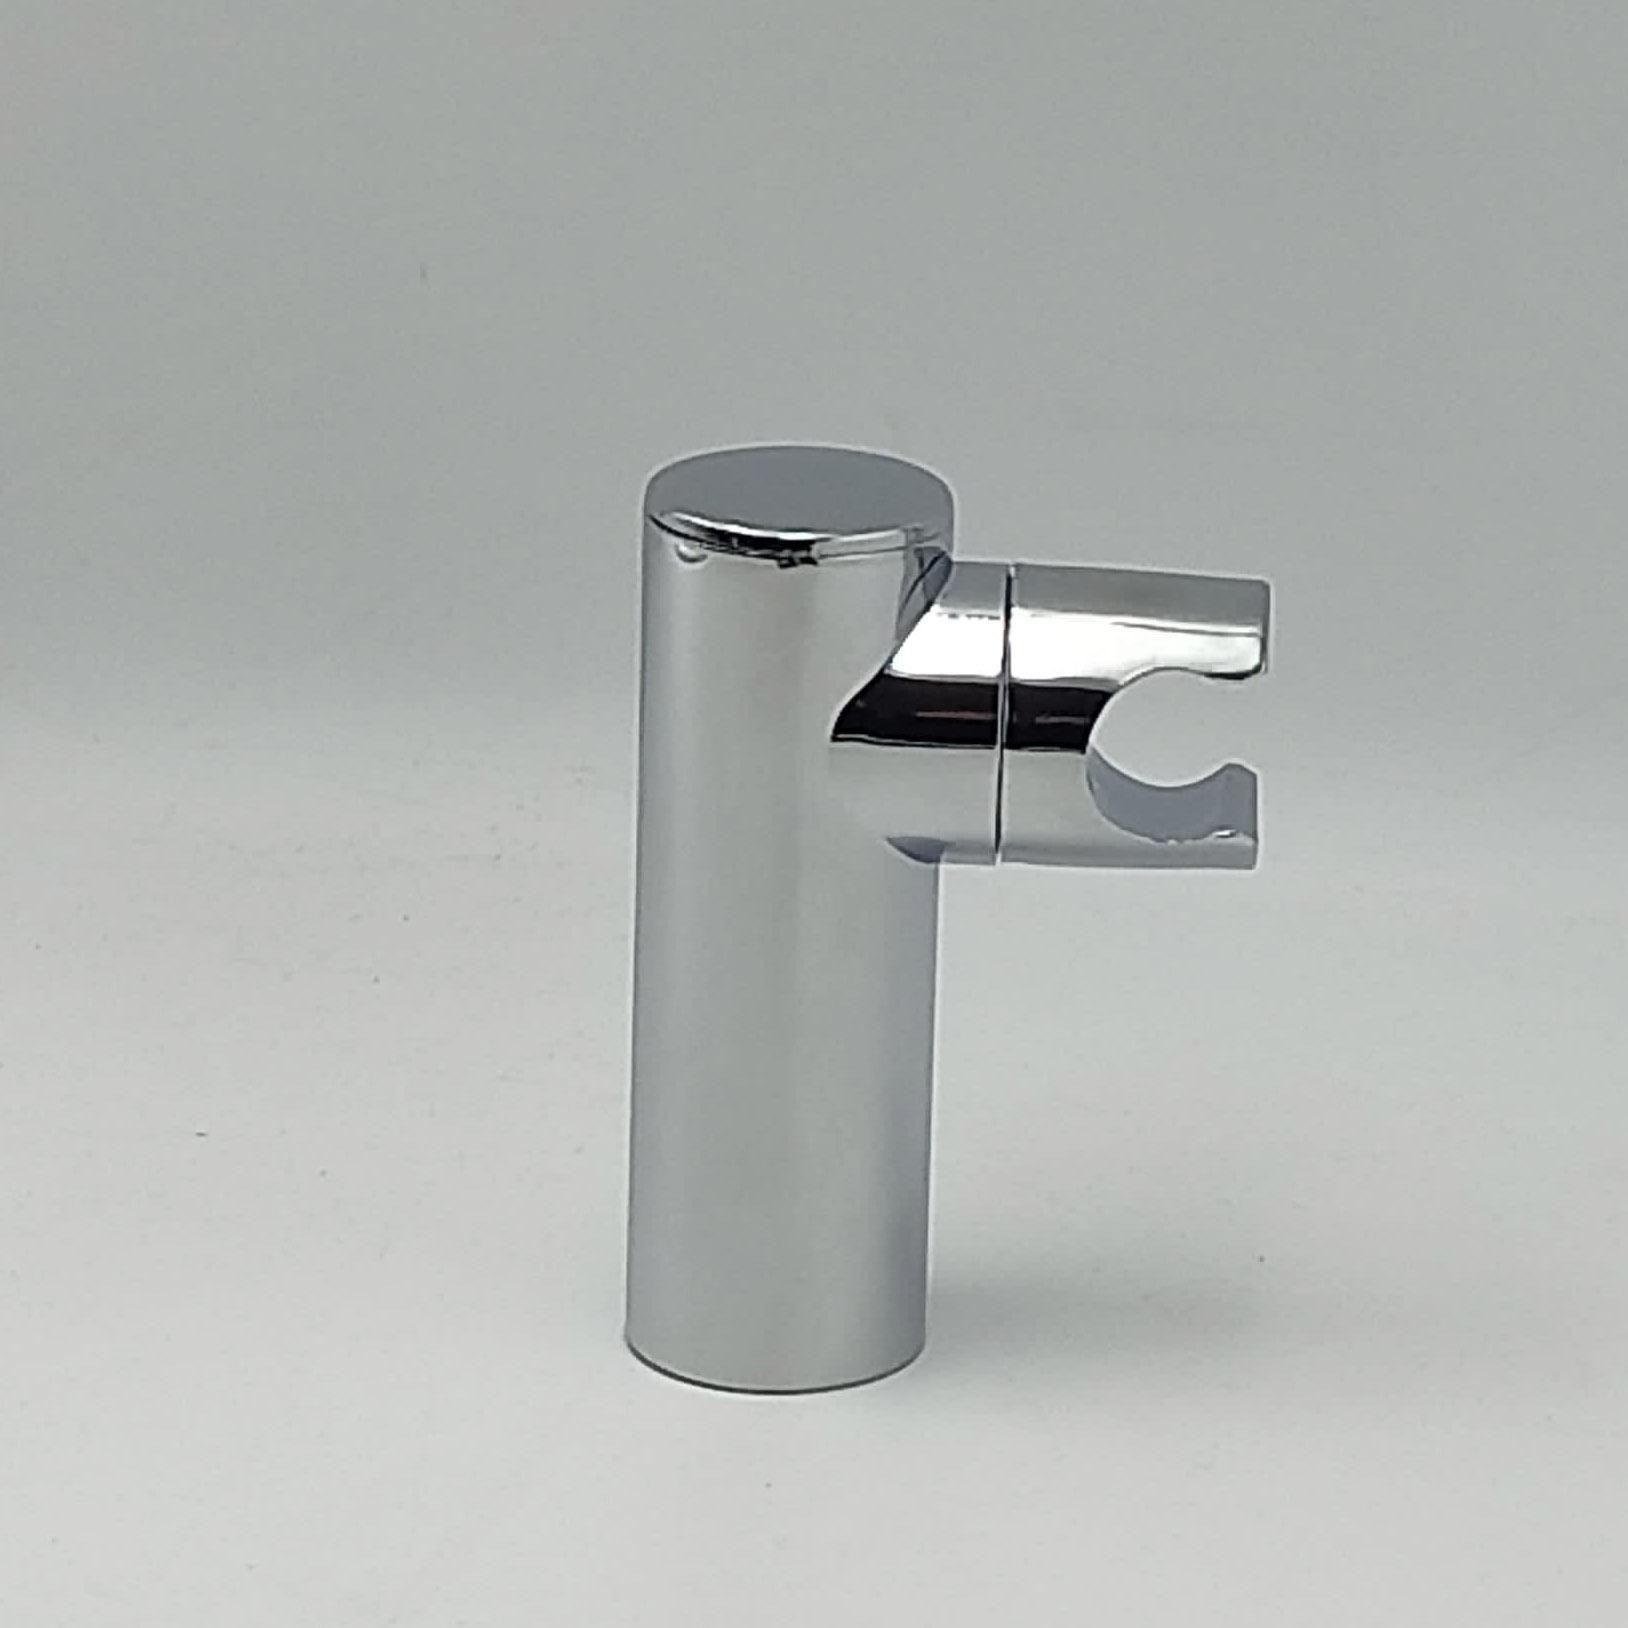 600518110 Soporte ducha minimalista